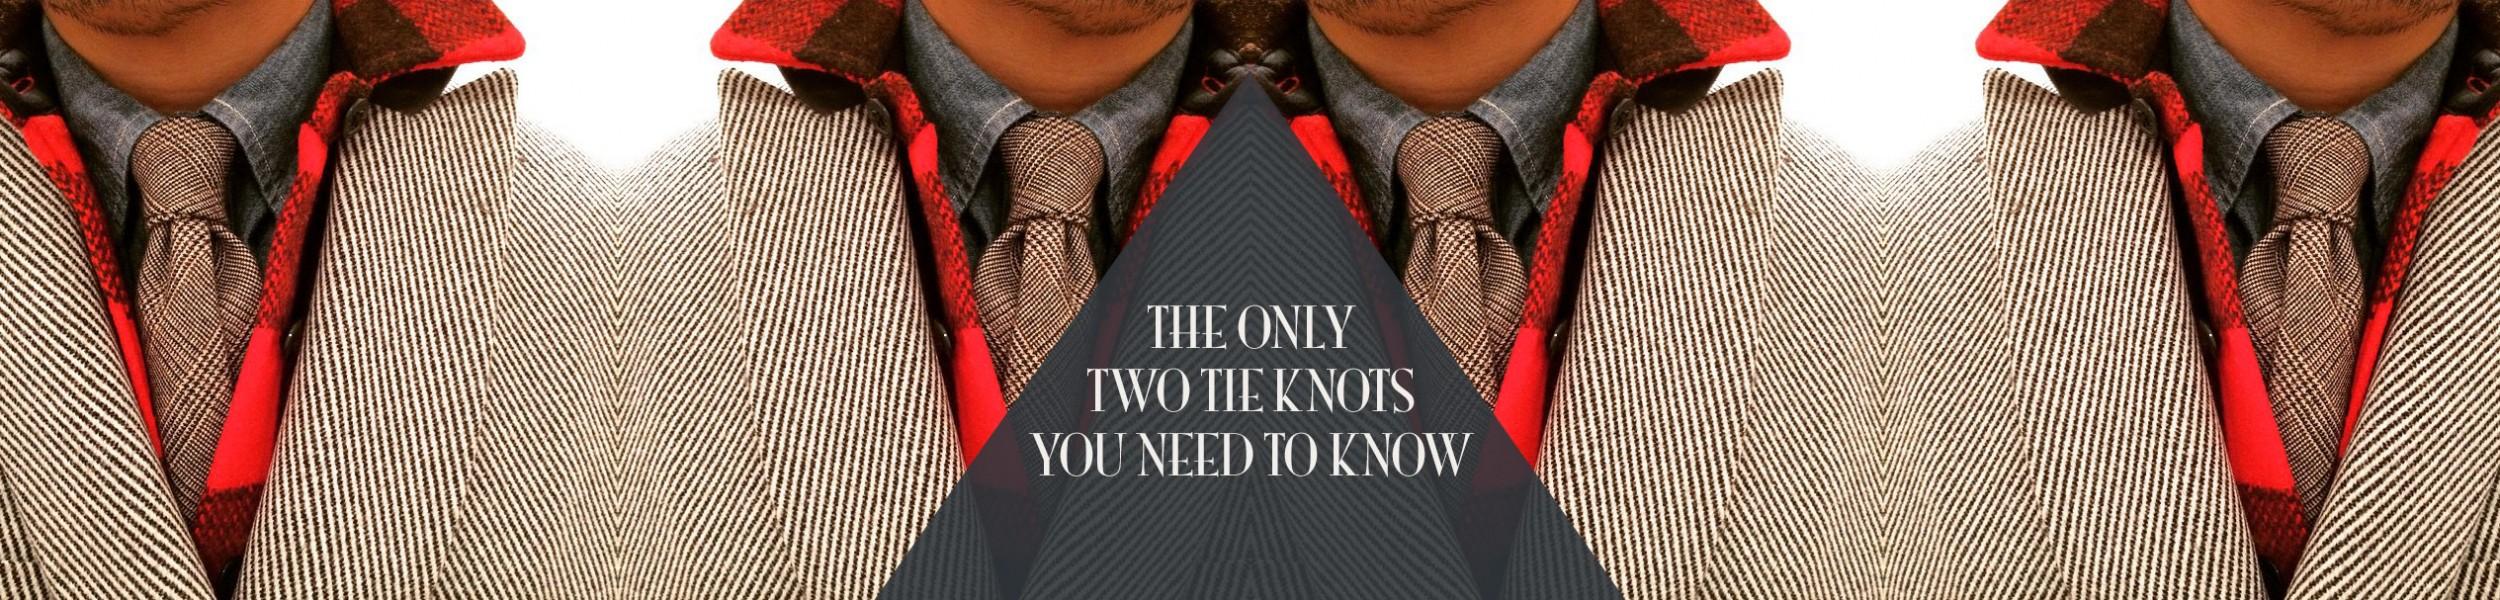 Tie A Windsor Knot Diagram